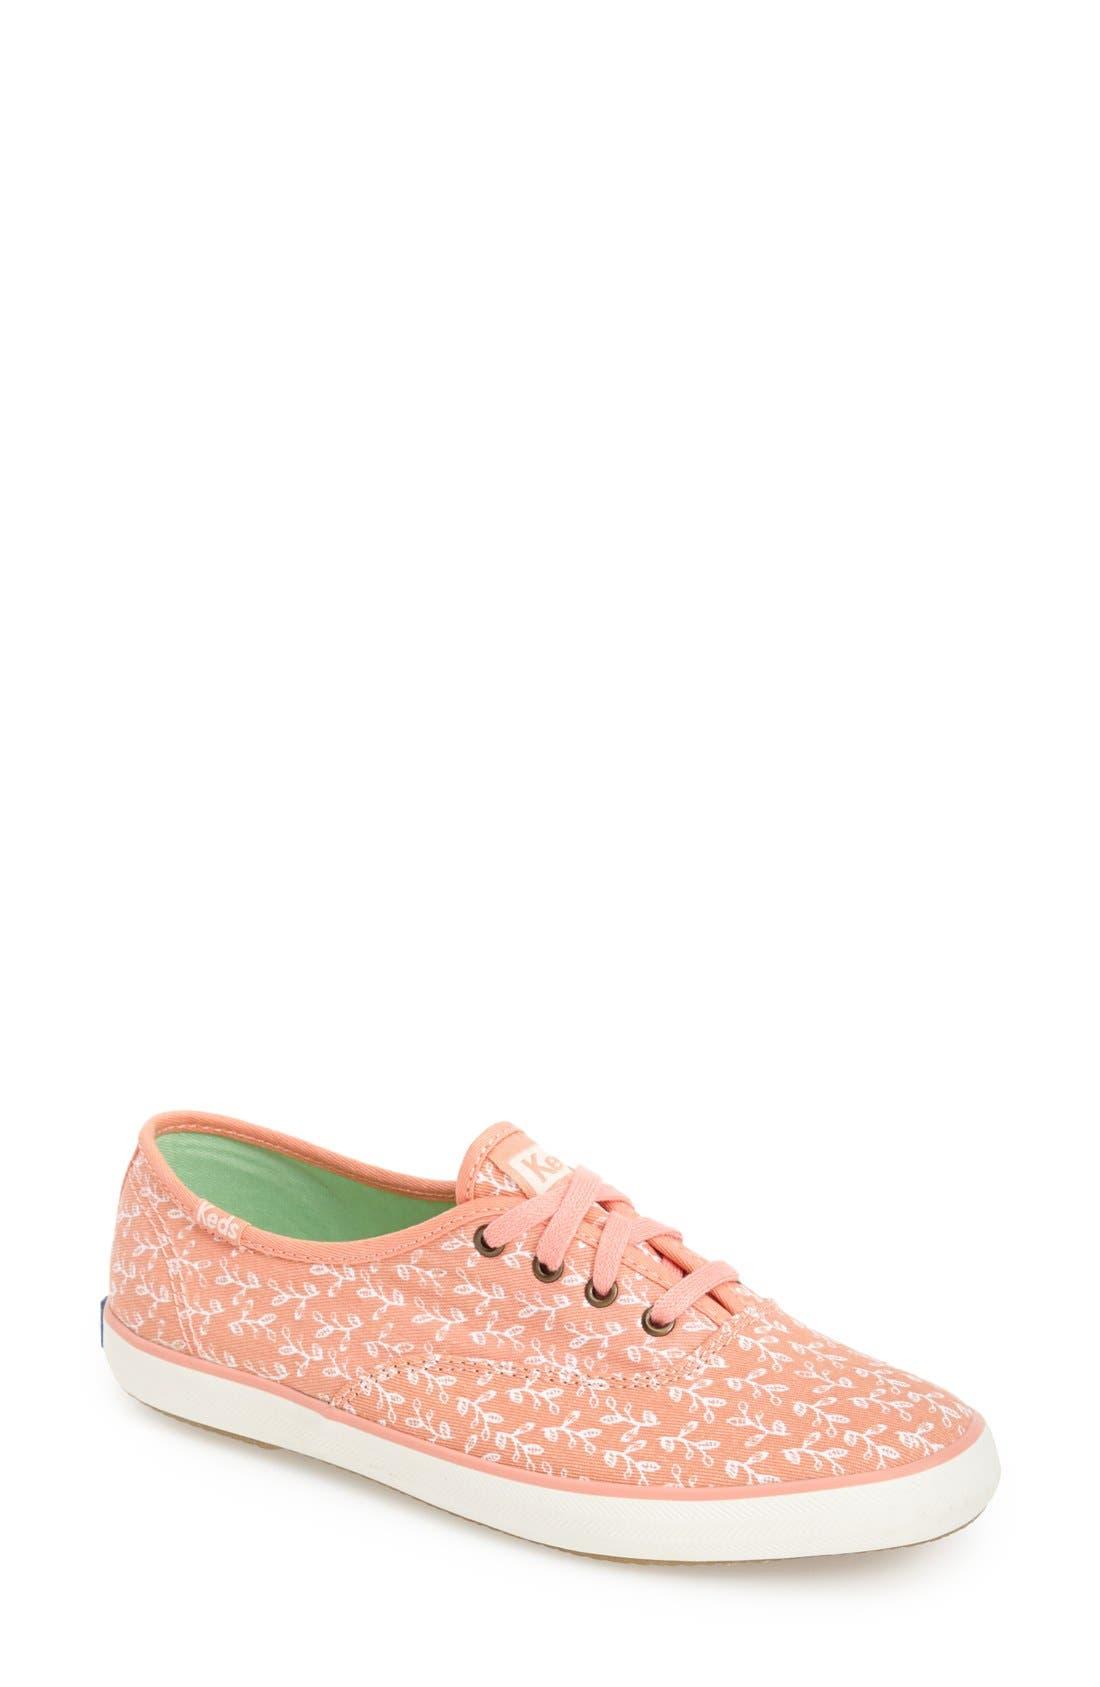 Alternate Image 1 Selected - Keds® 'Champion - Botanical' Sneaker (Women)